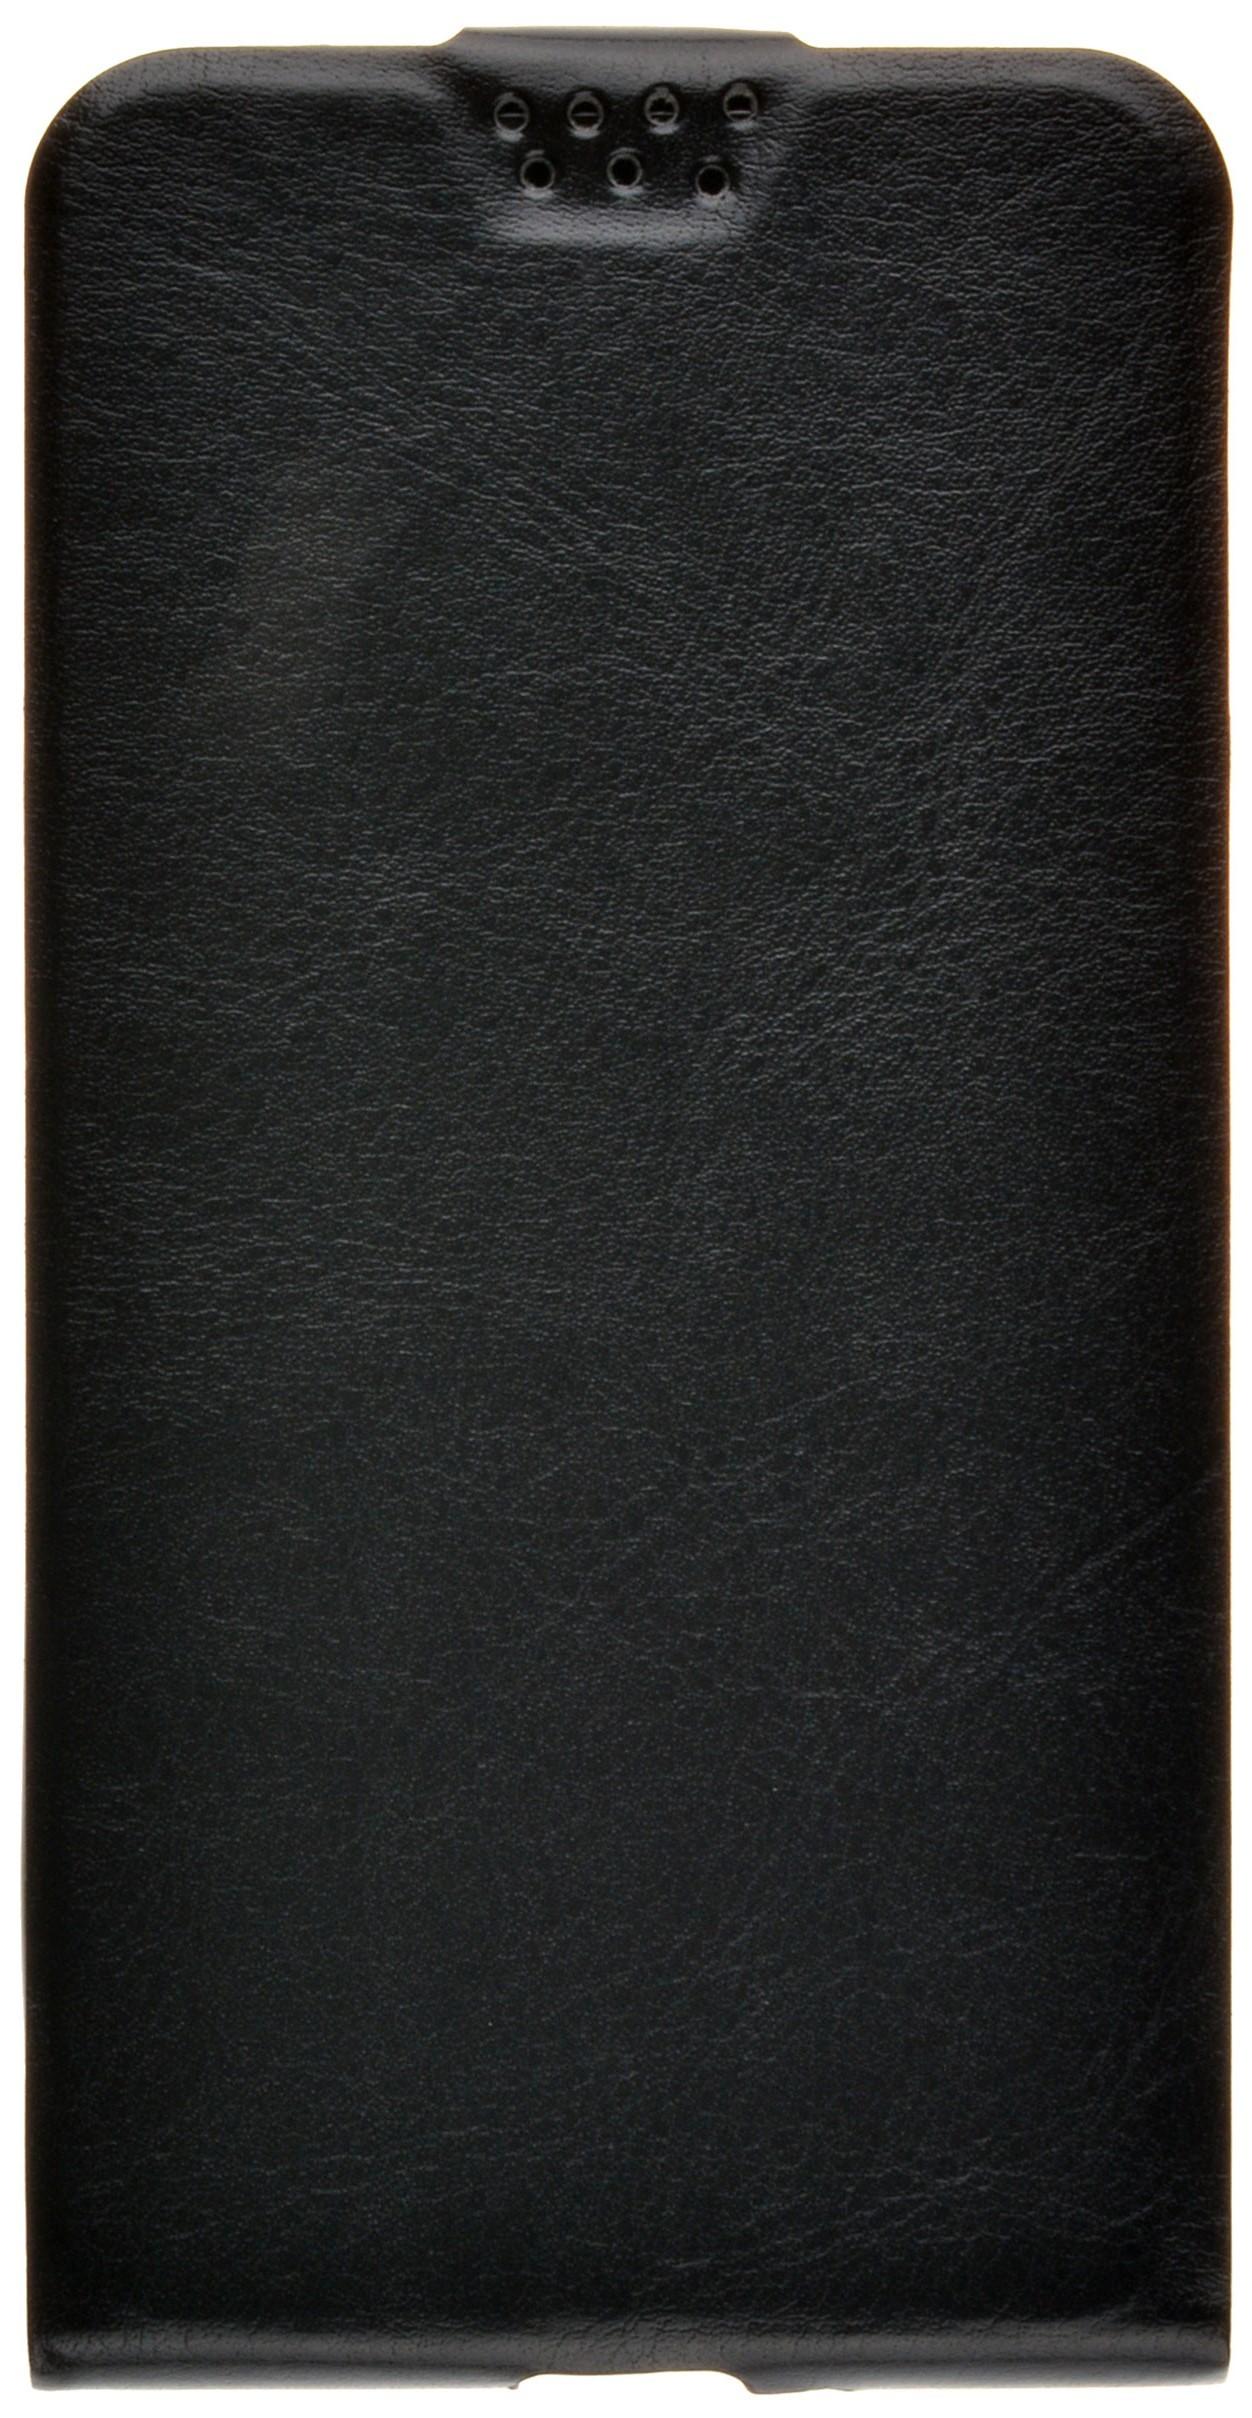 Чехол для сотового телефона skinBOX Flip slim, 4660041407631, черный flip pu leather protective stand case cover for zte blade l2